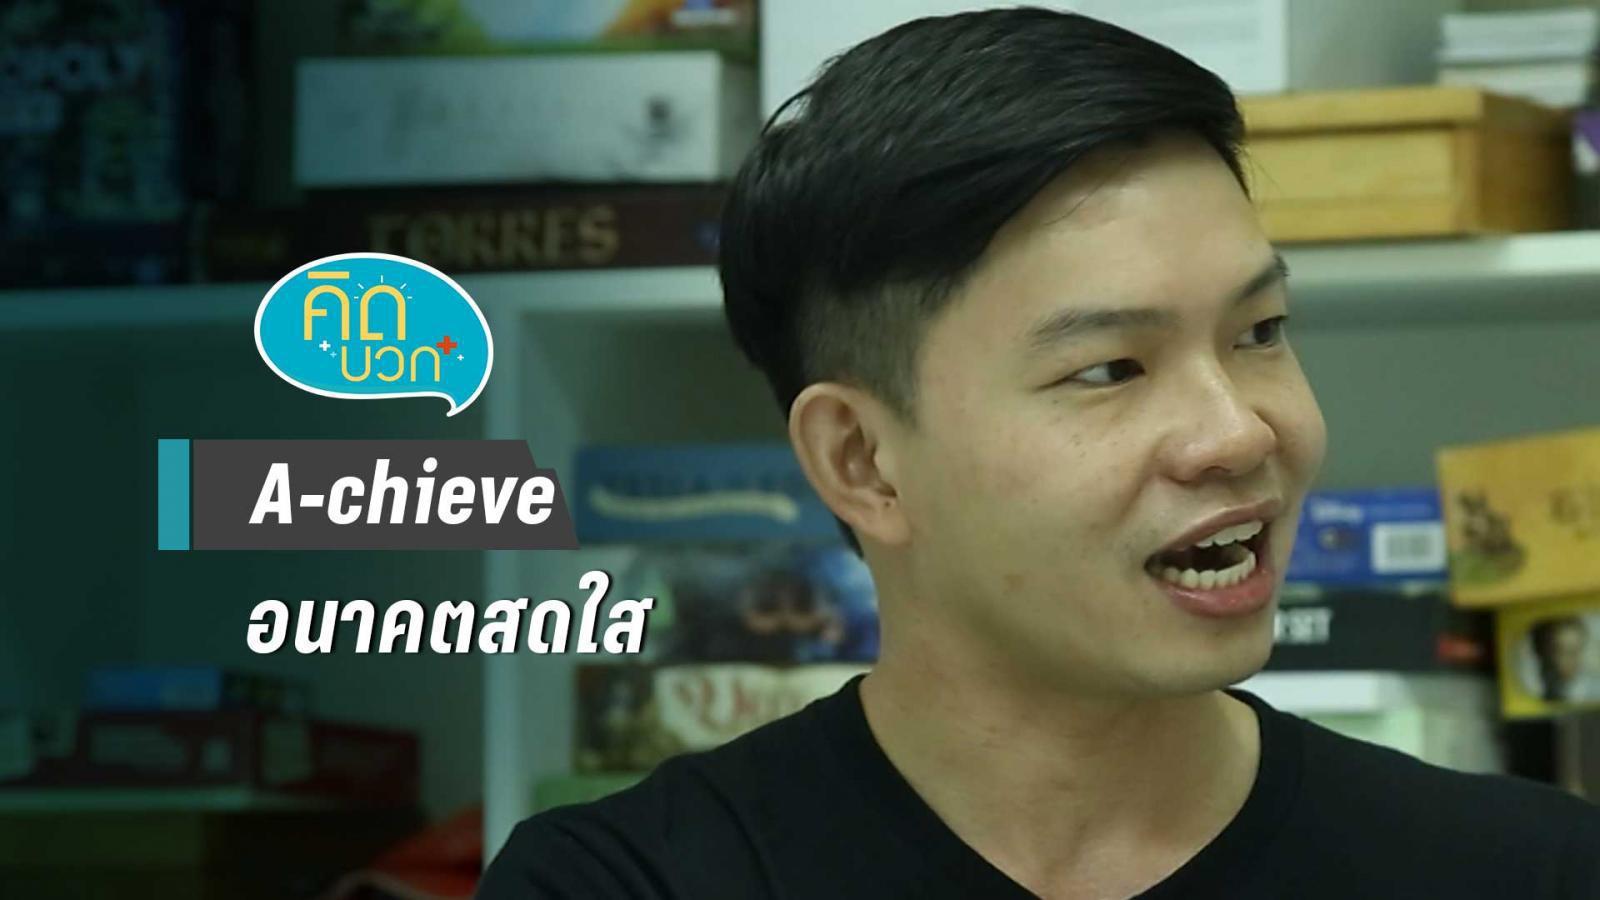 A-chieve อนาคตสดใส กับชีวิตที่ใช่และอาชีพที่ชอบ